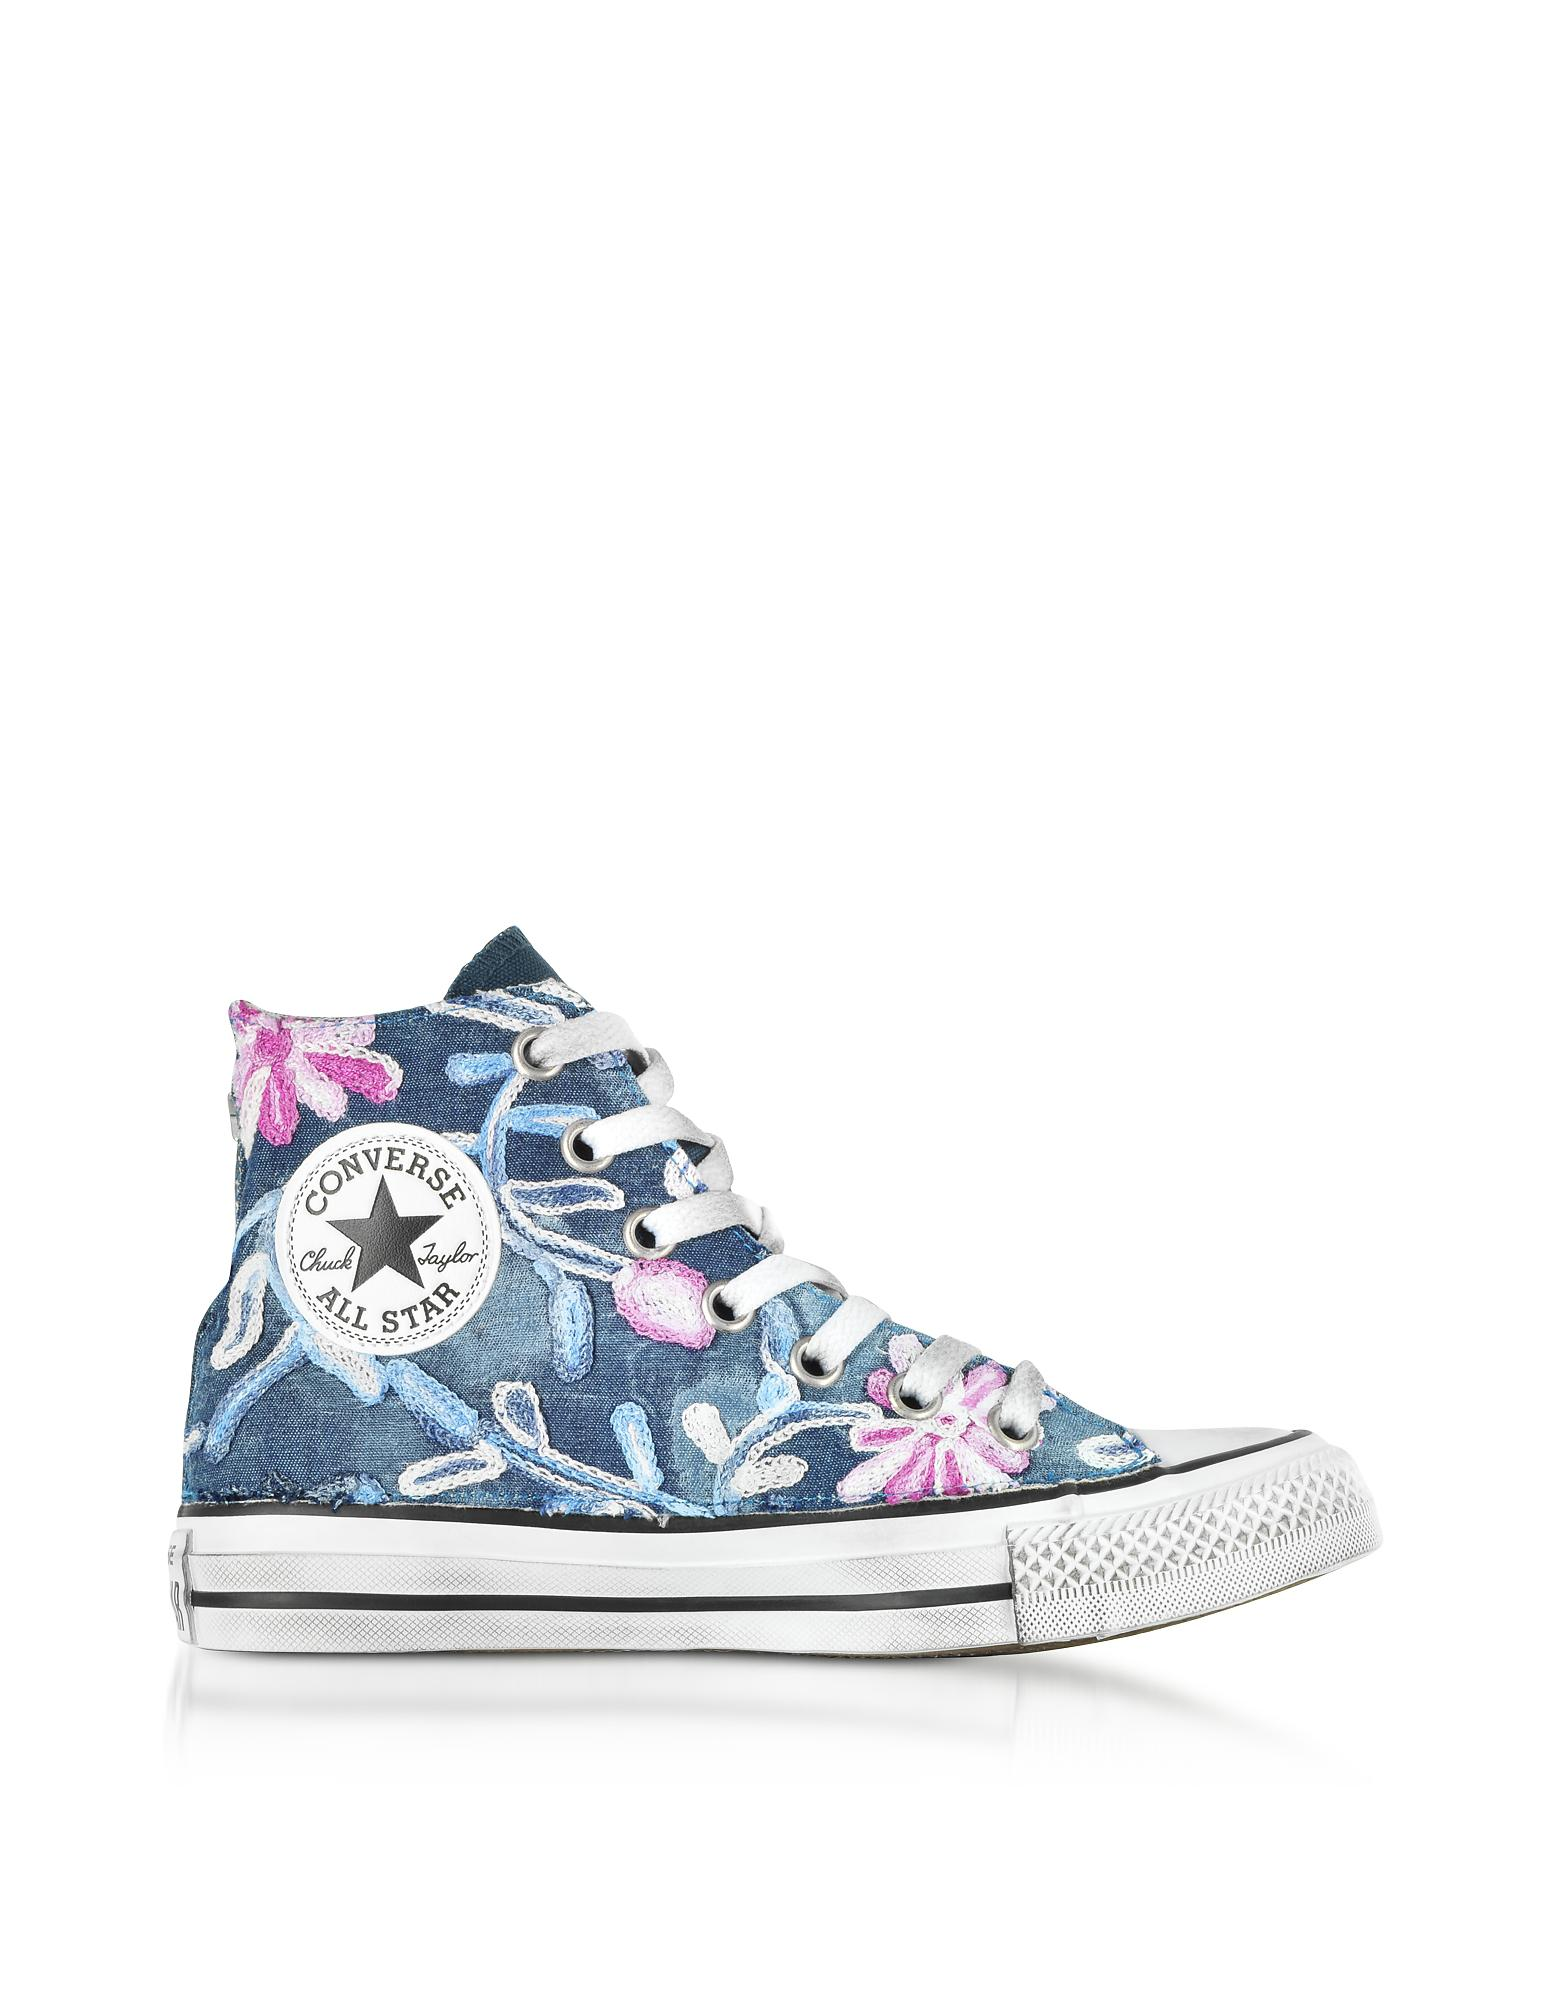 54631c055fa Lyst - Converse Chuck Taylor All Star High Vintage Denim Flowers ...